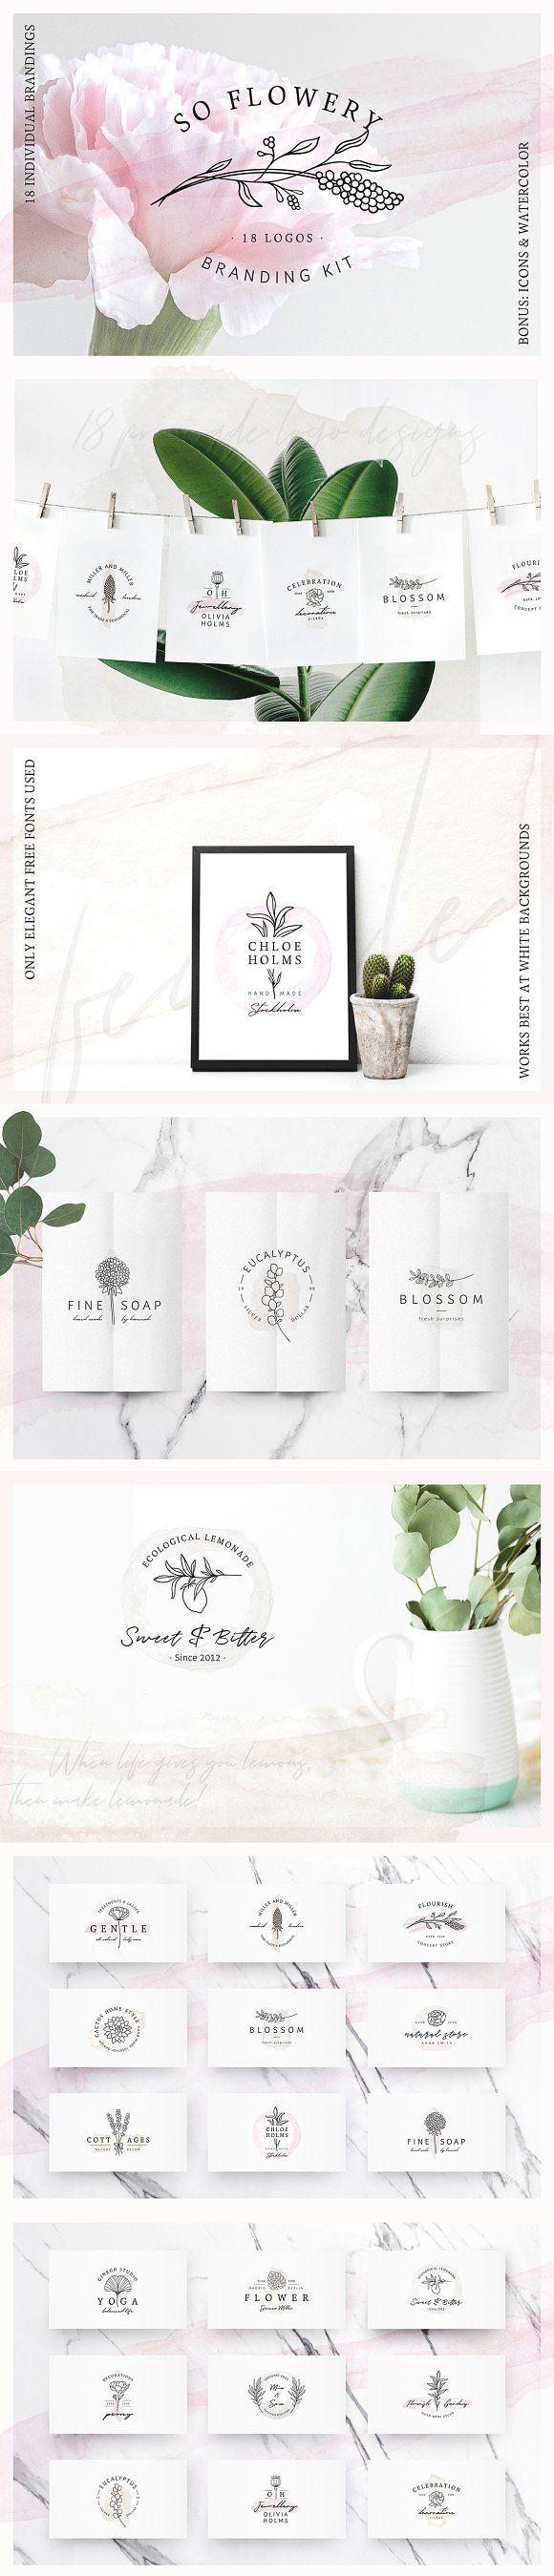 So Flowery Branding Kit+Watercolours by AgataCreate on @creativemarket